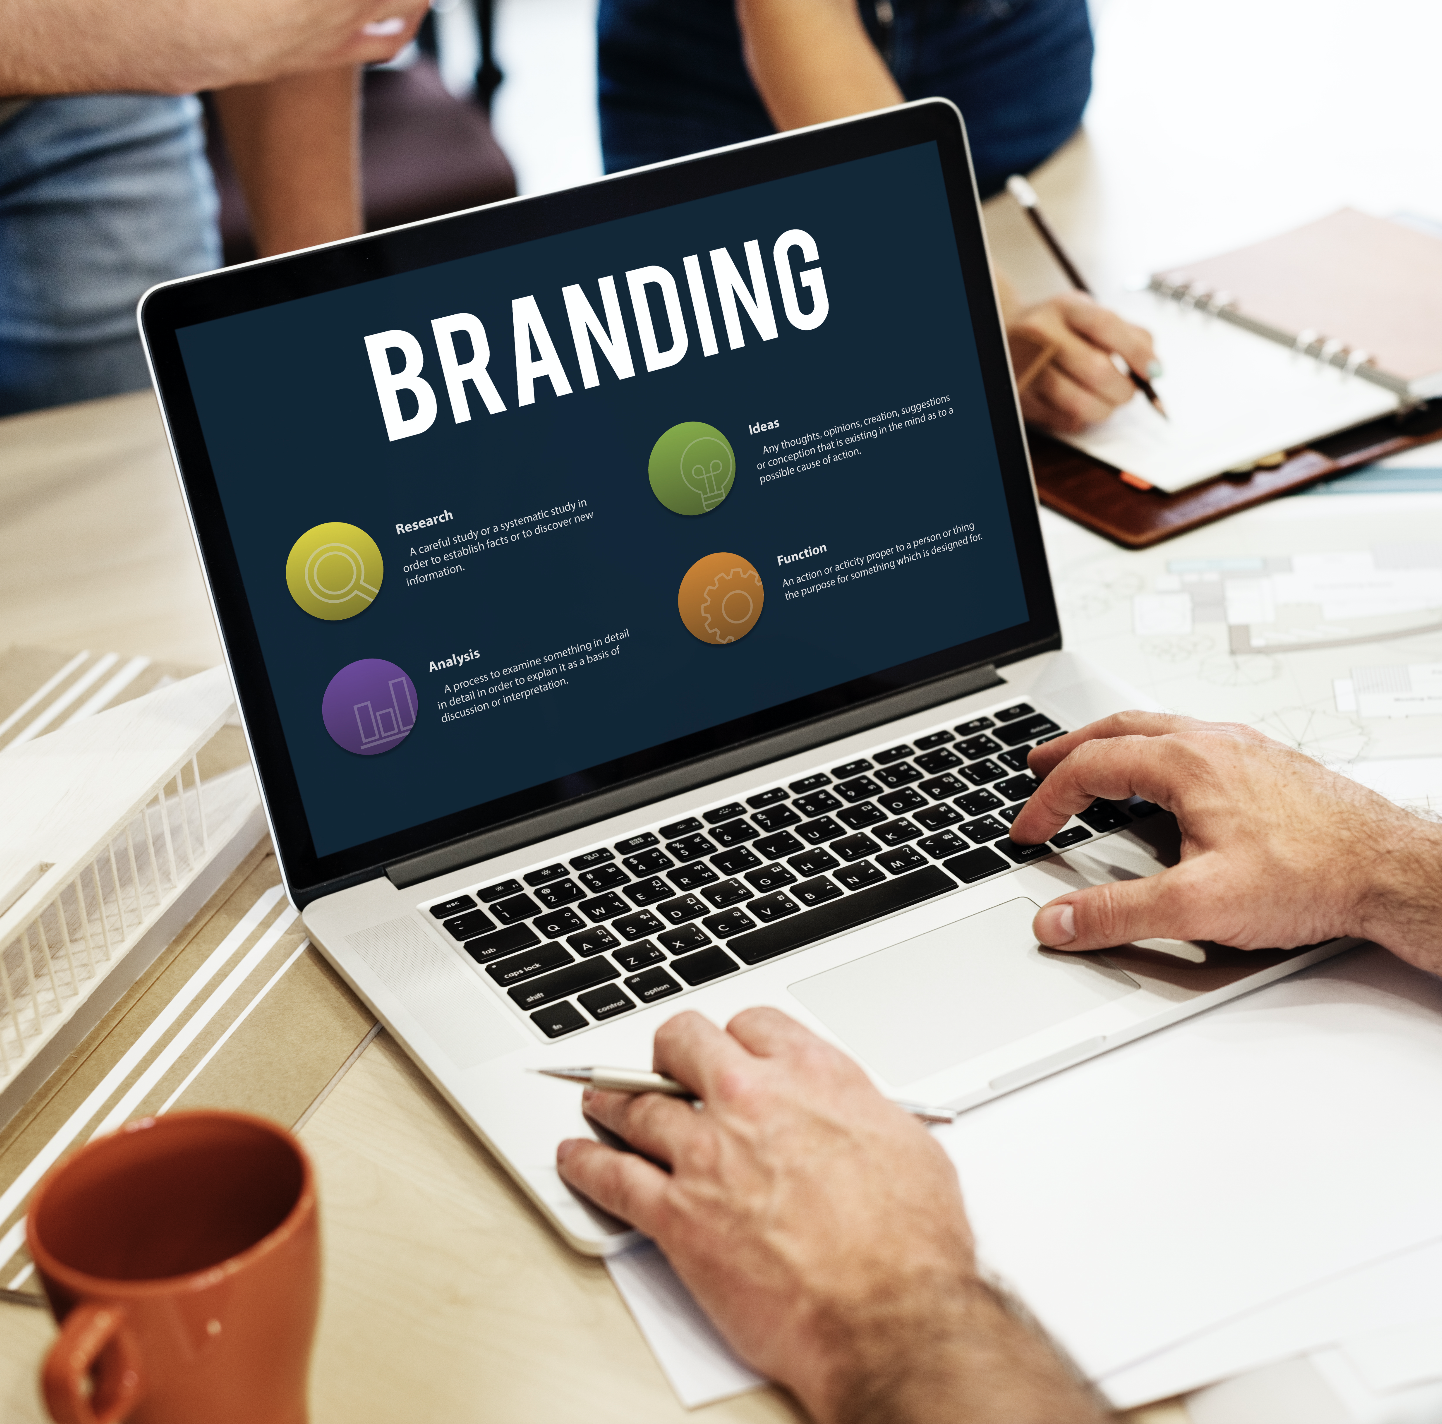 Branding helps your company grow globally